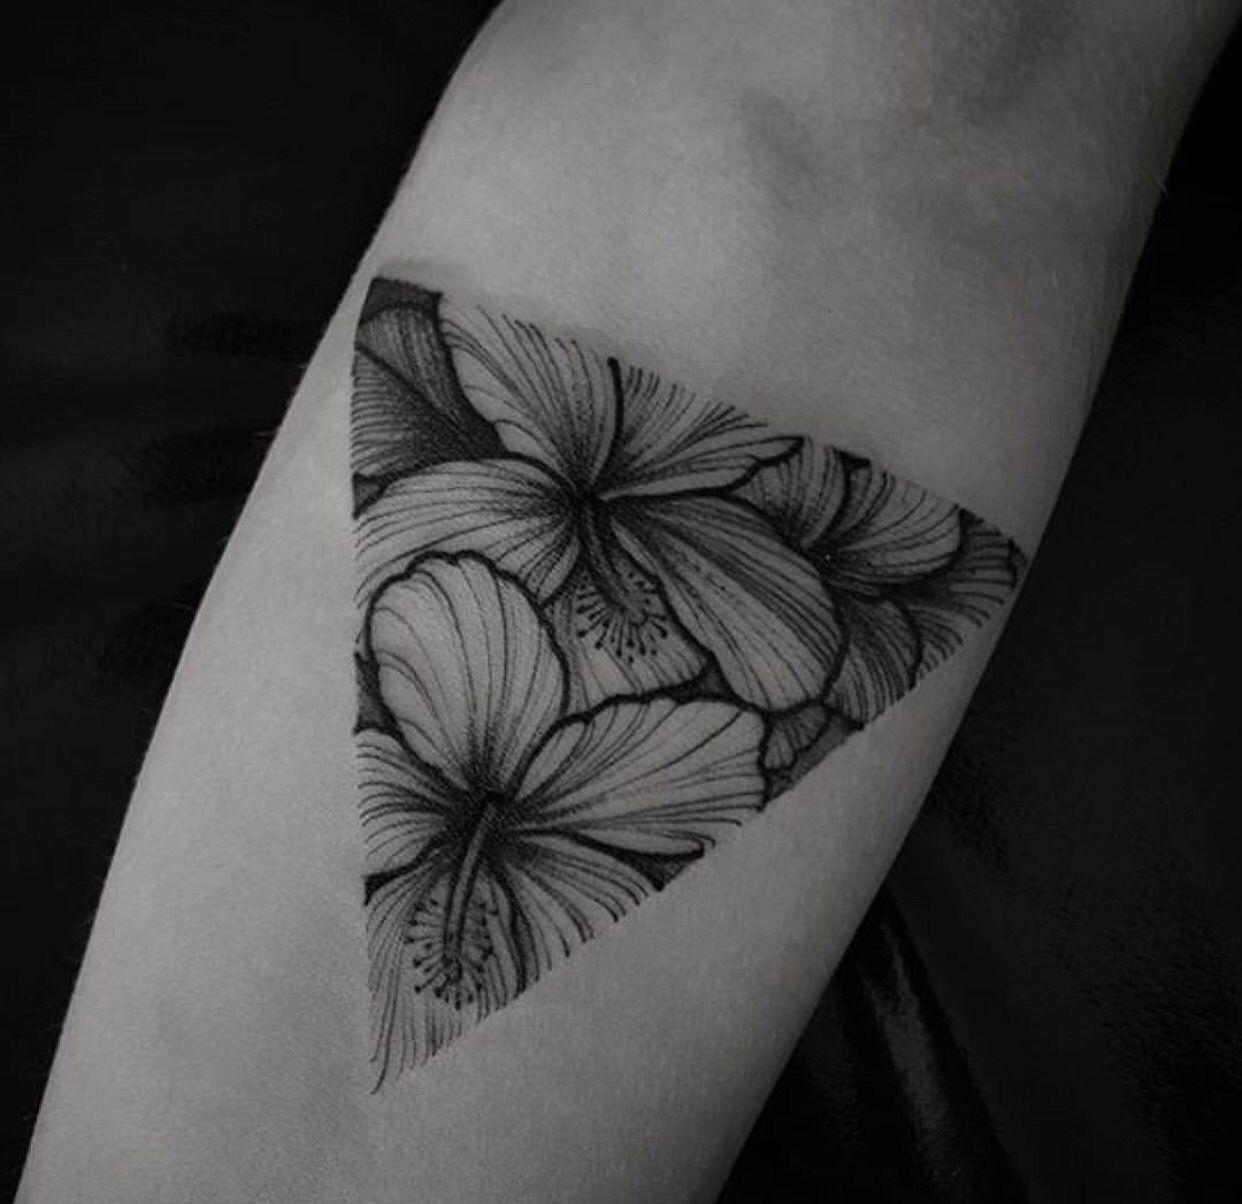 Black work tattoo hibiscus tattoos pinterest black work tattoo black work tattoo hibiscus izmirmasajfo